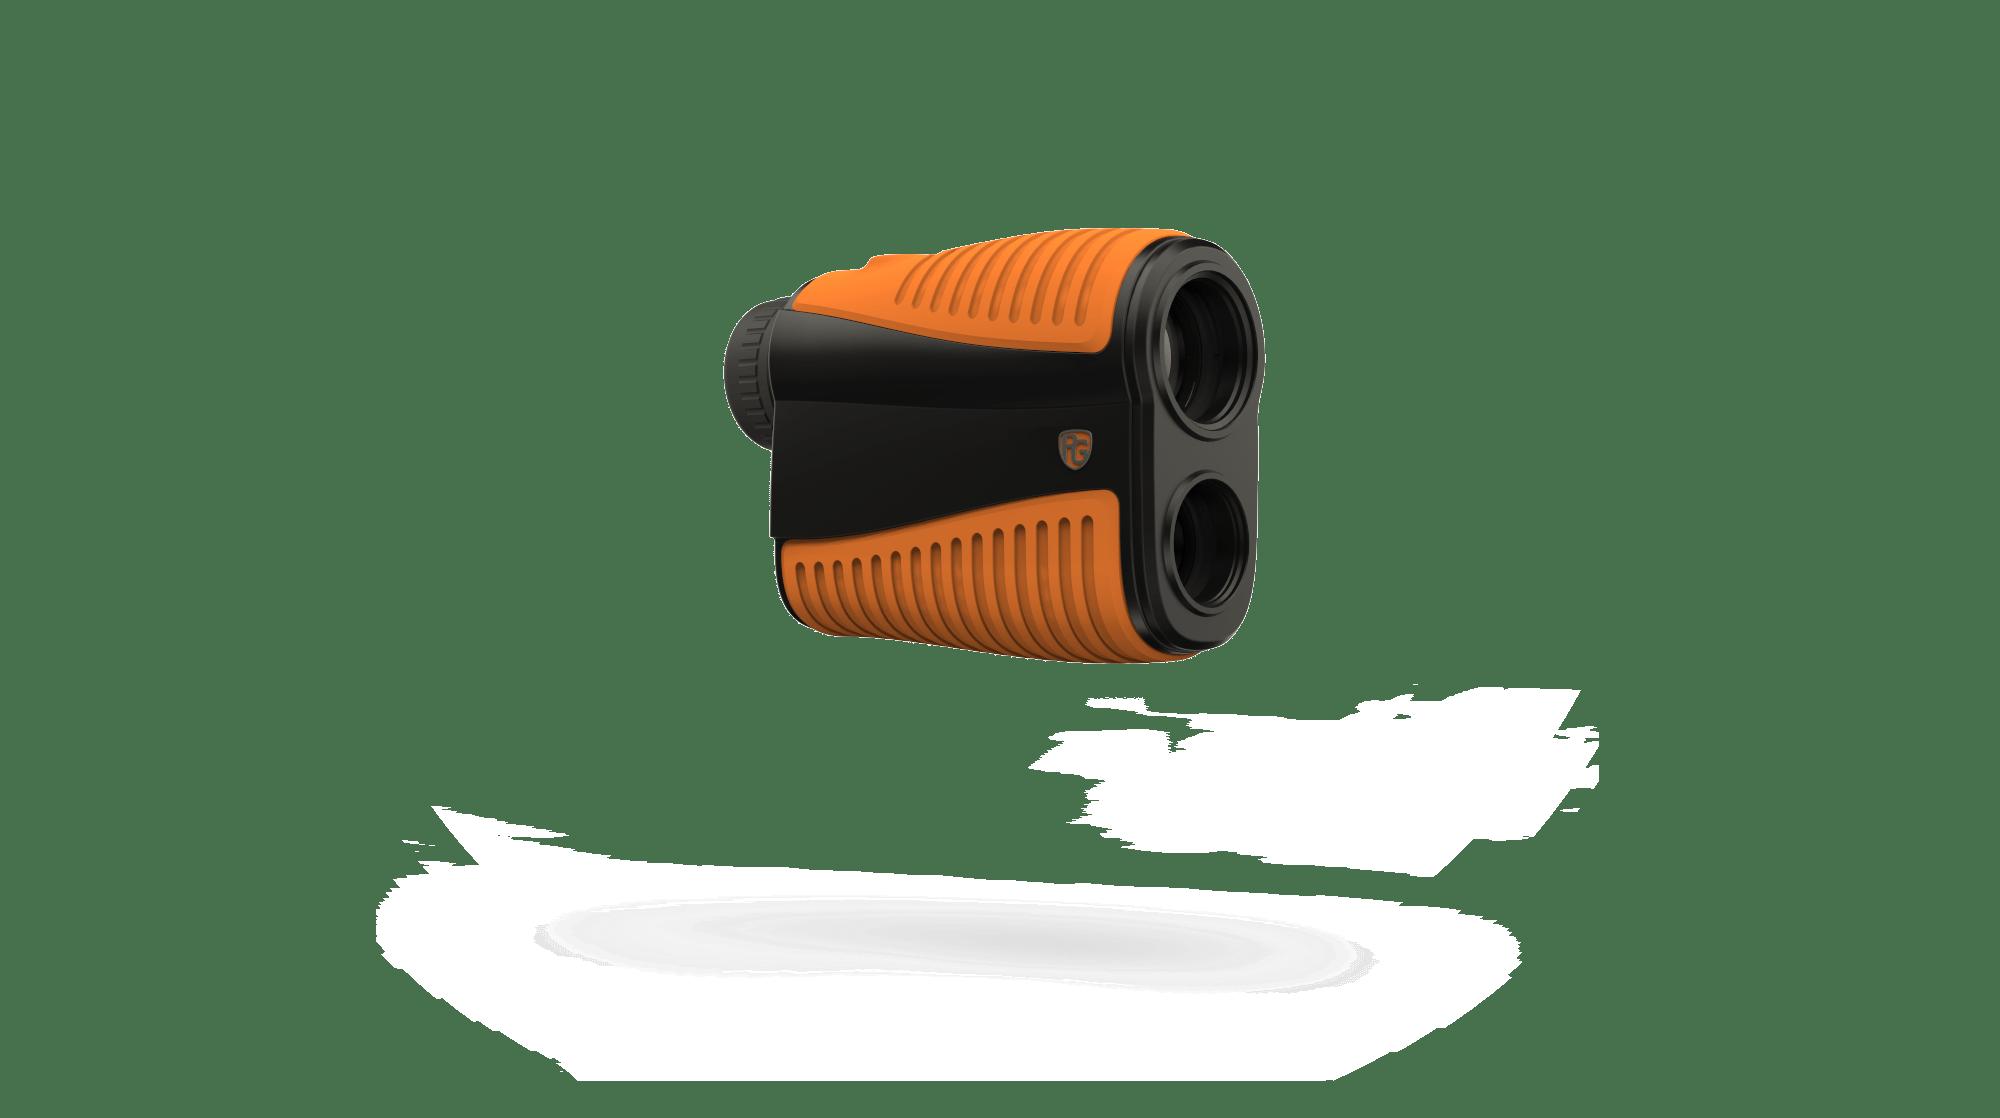 rangefinder-img-45